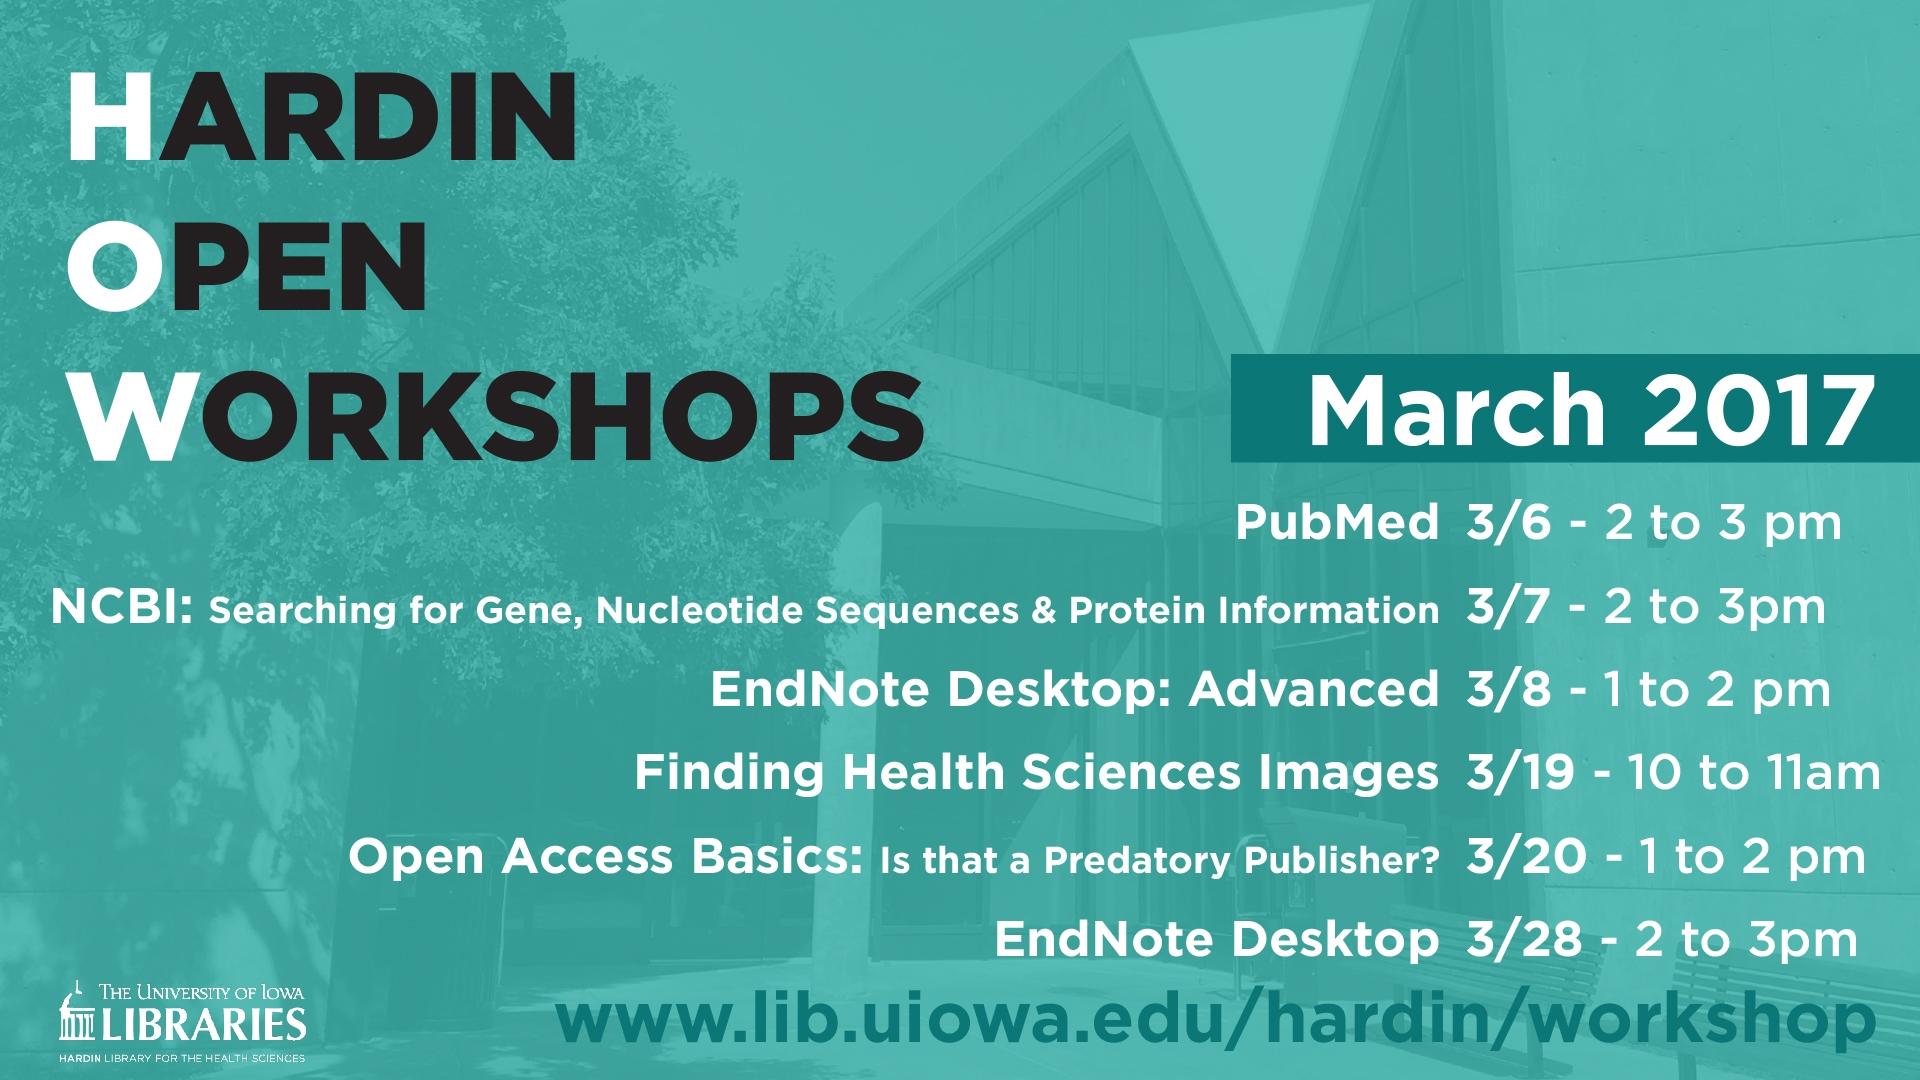 Hardin Workshops